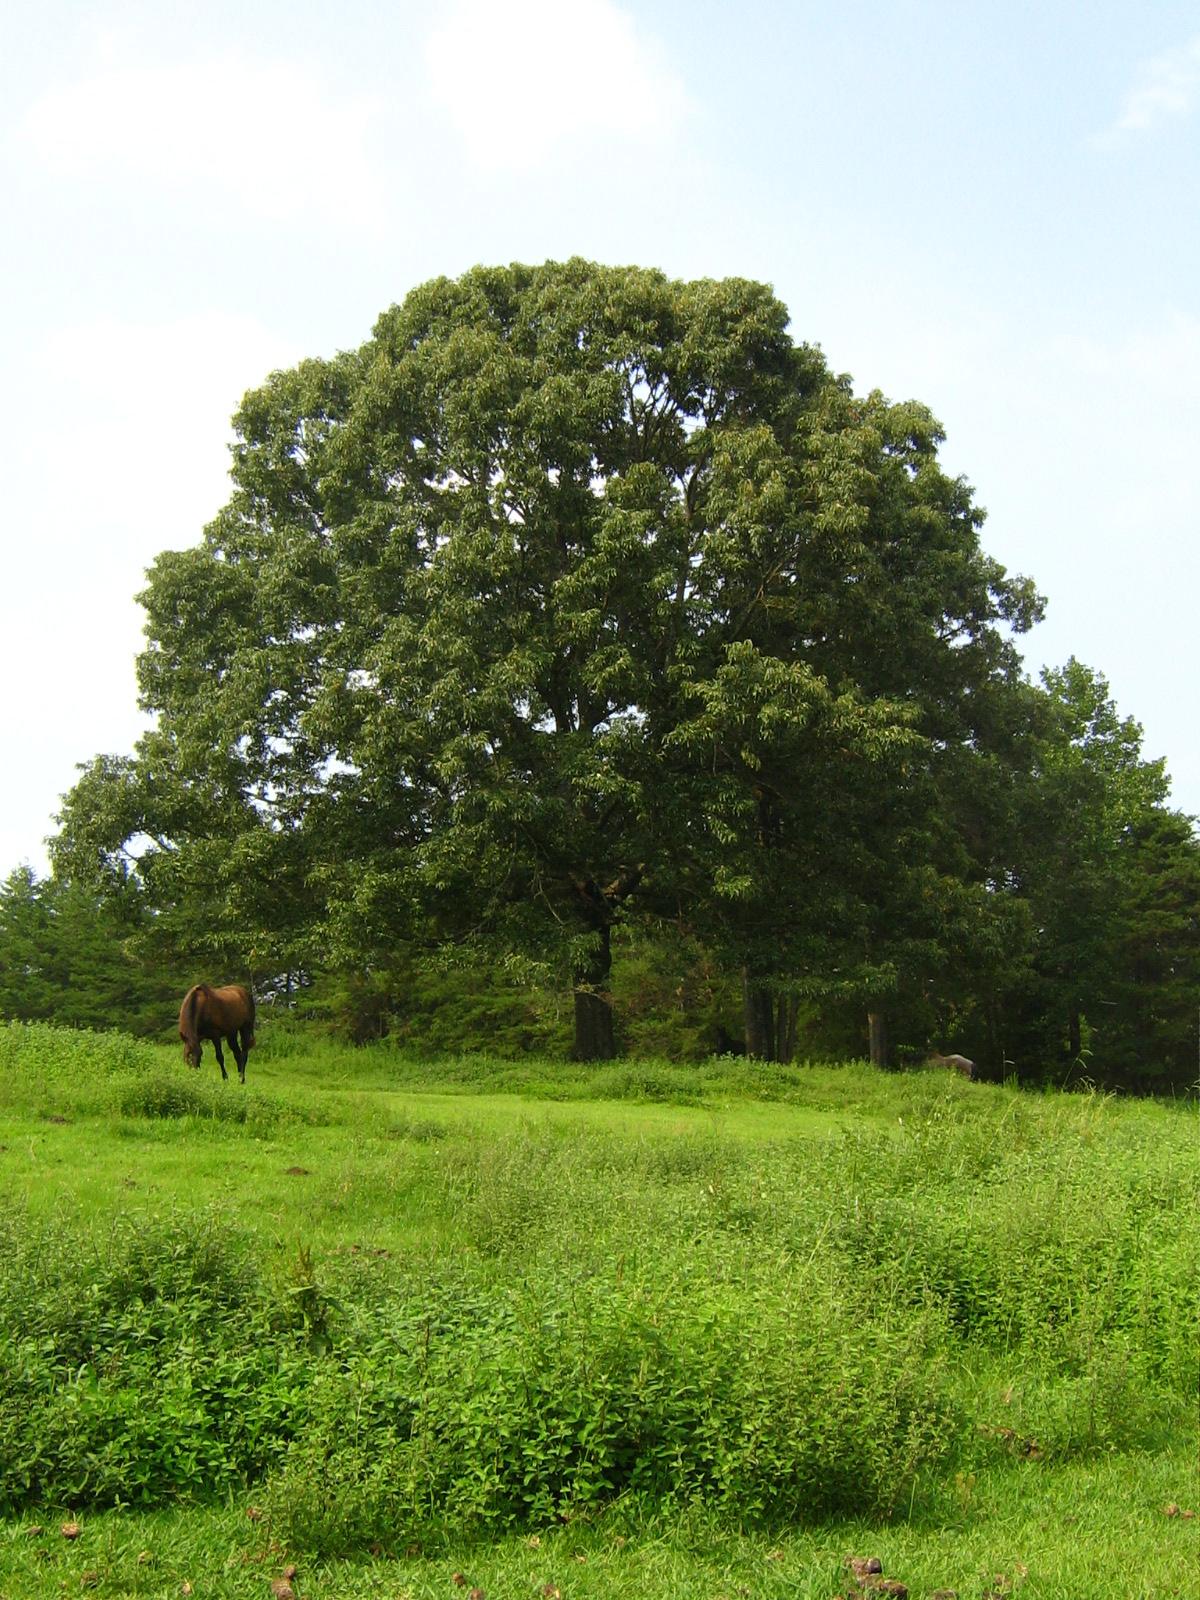 67 - Big Tree